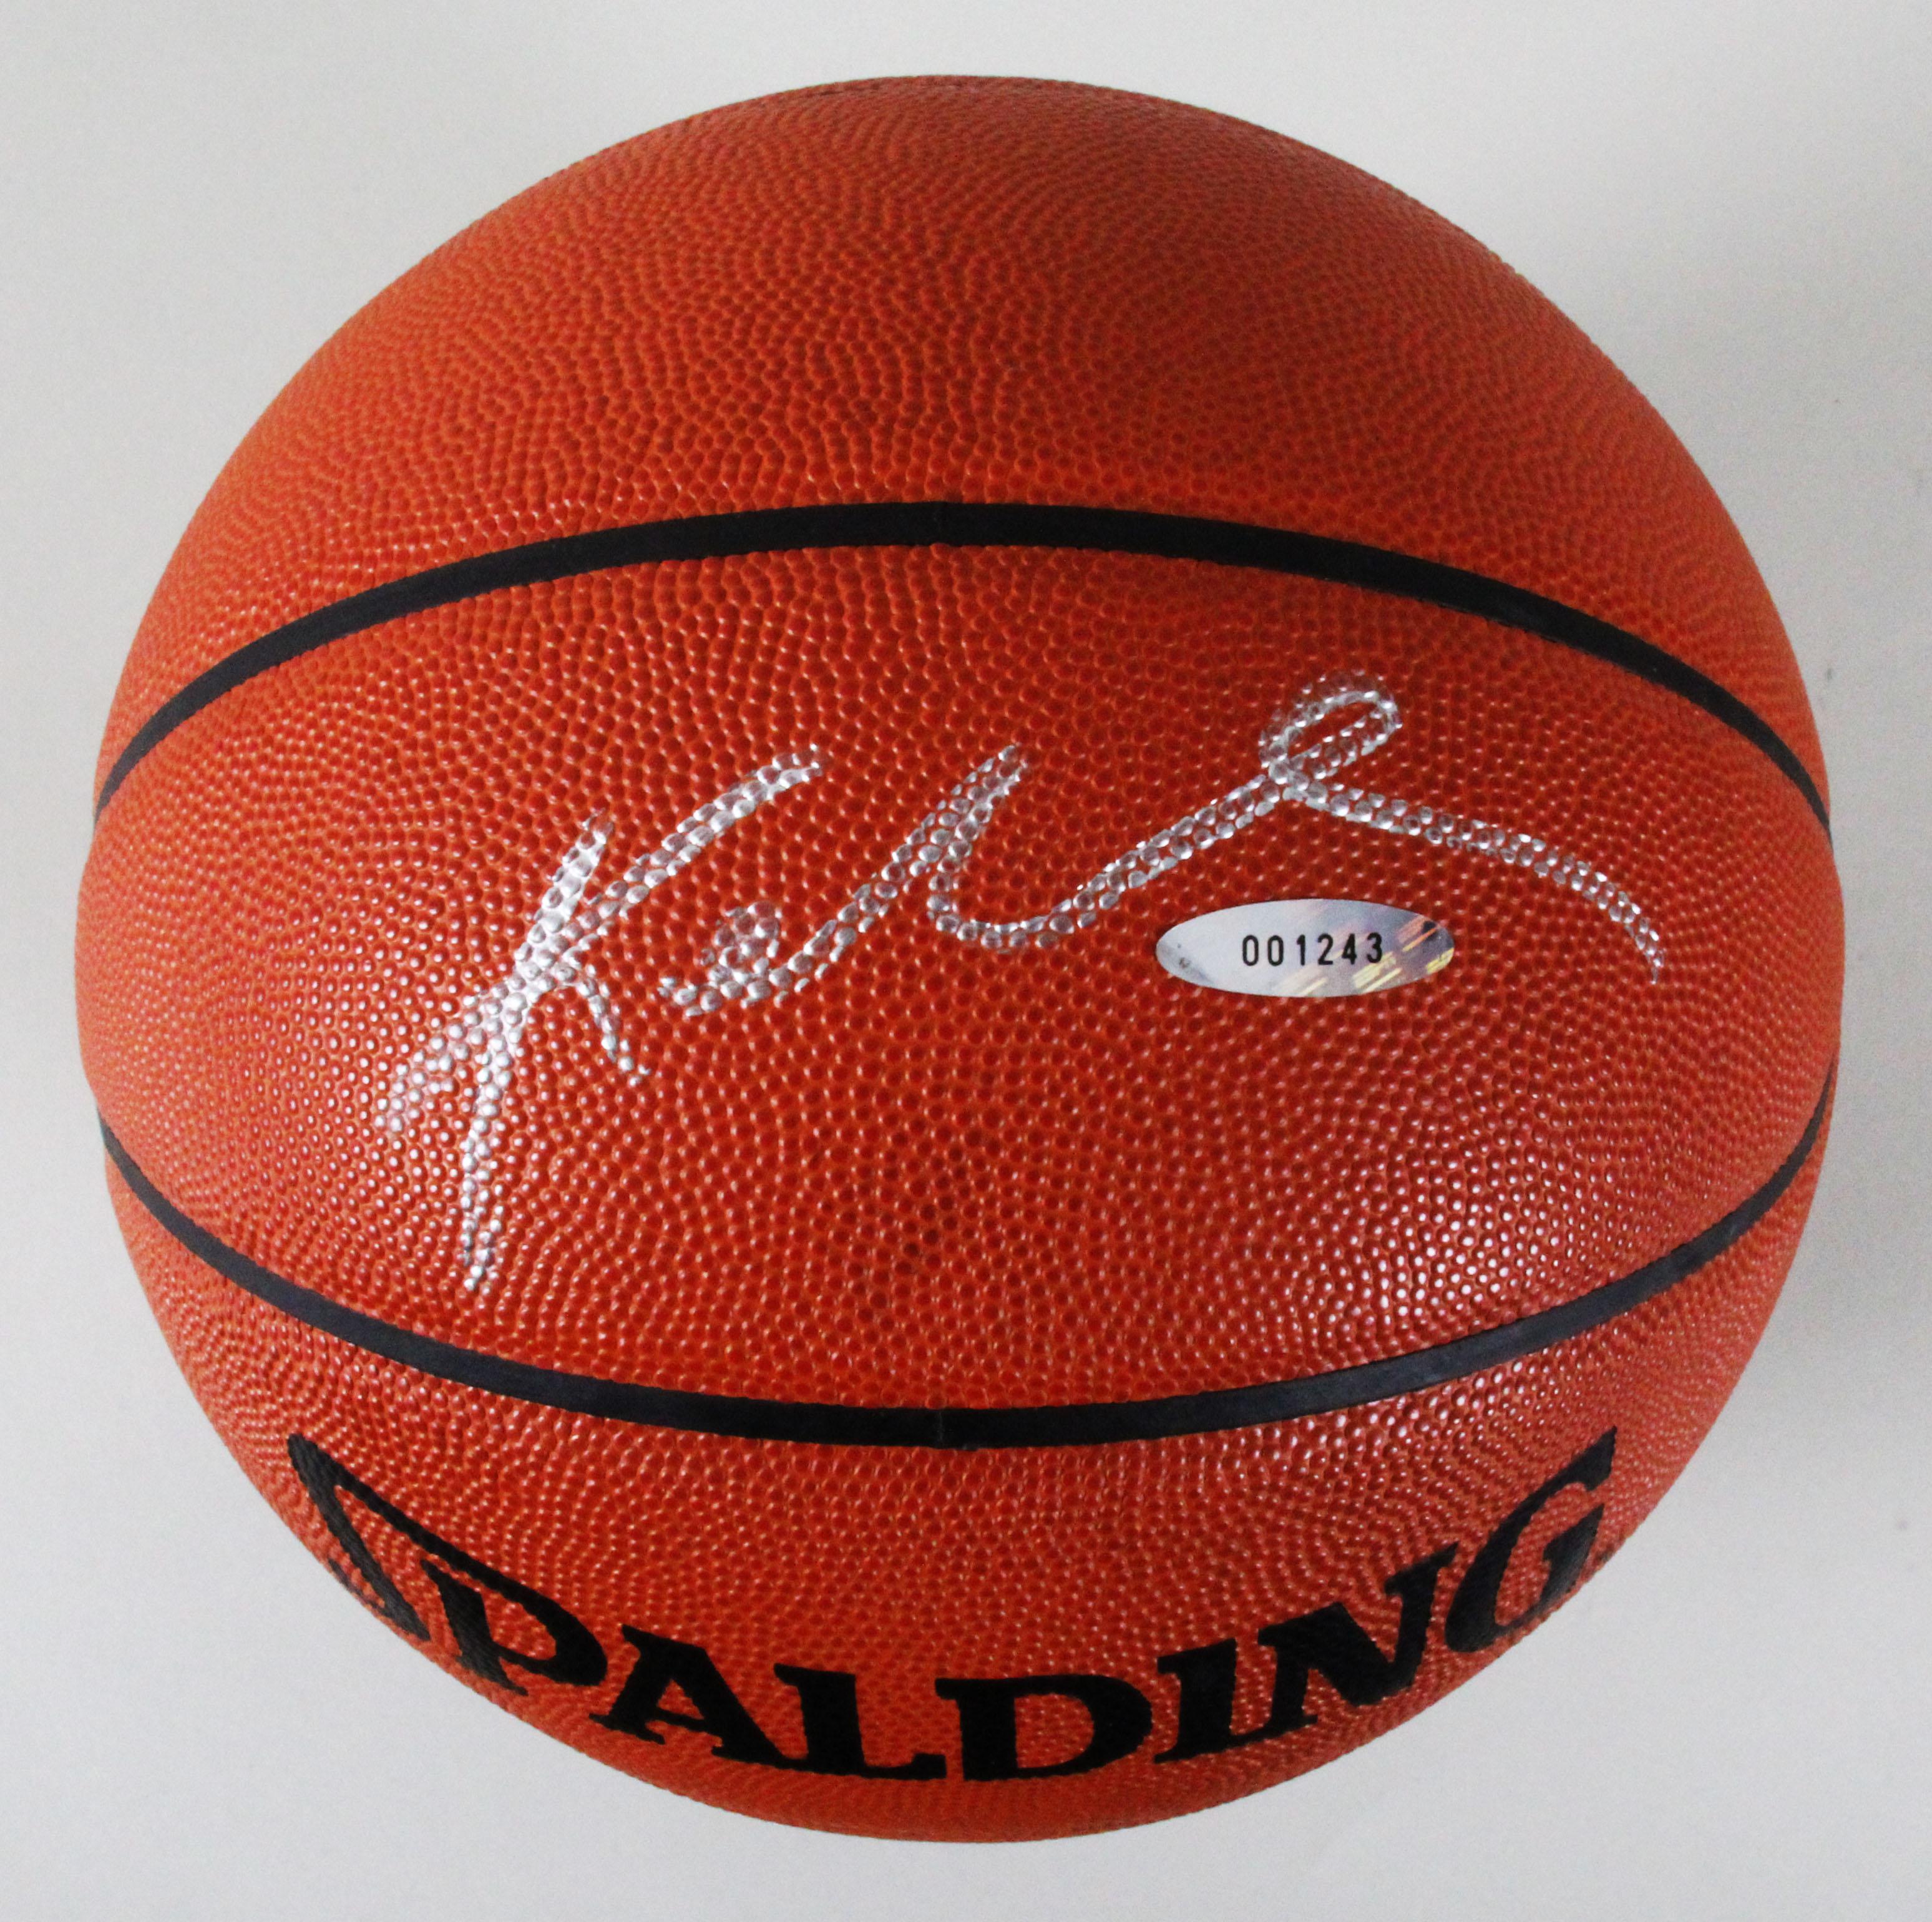 2e102a9f2ad0 Kobe Bryant Signed Basketball Lakers – COA PSA DNA